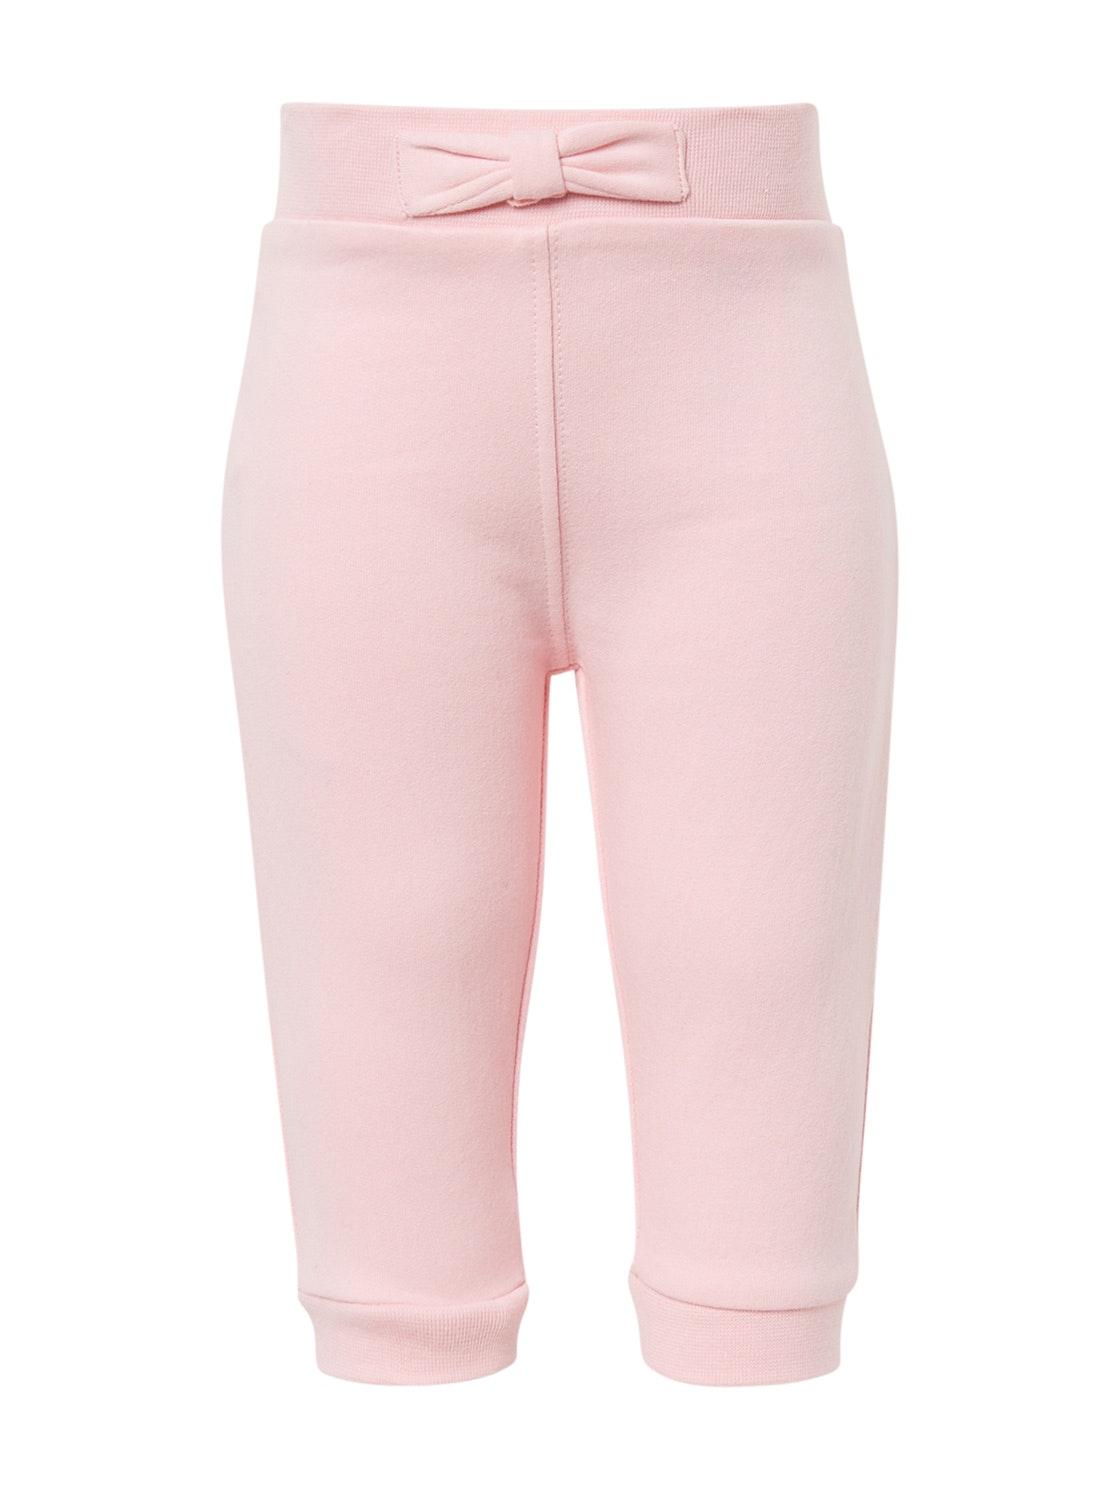 jogging pants patterned, rose shadow-rose